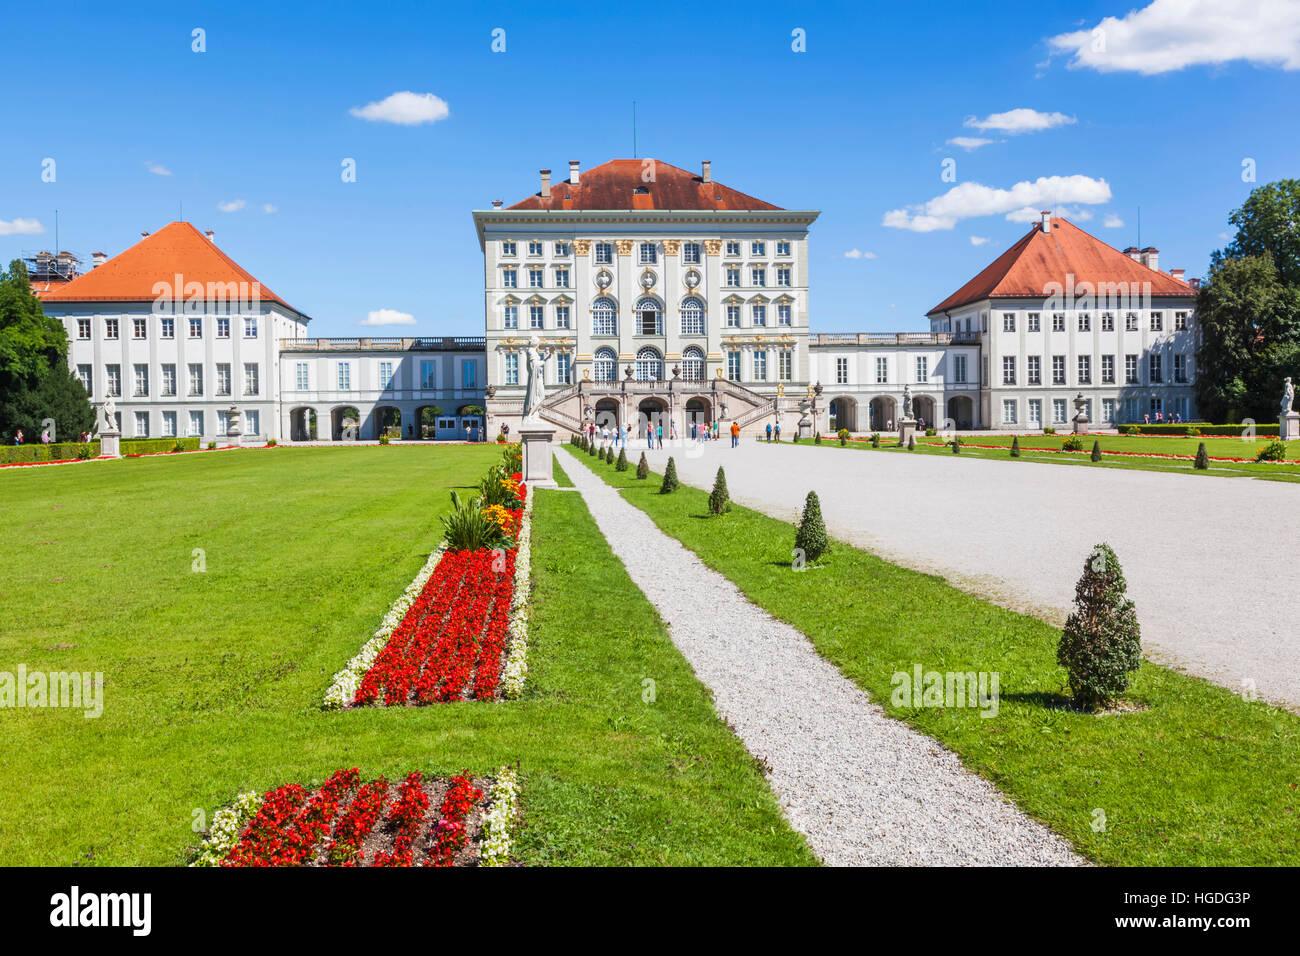 Germany, Bavaria, Munich, le palais Nymphenburg Photo Stock